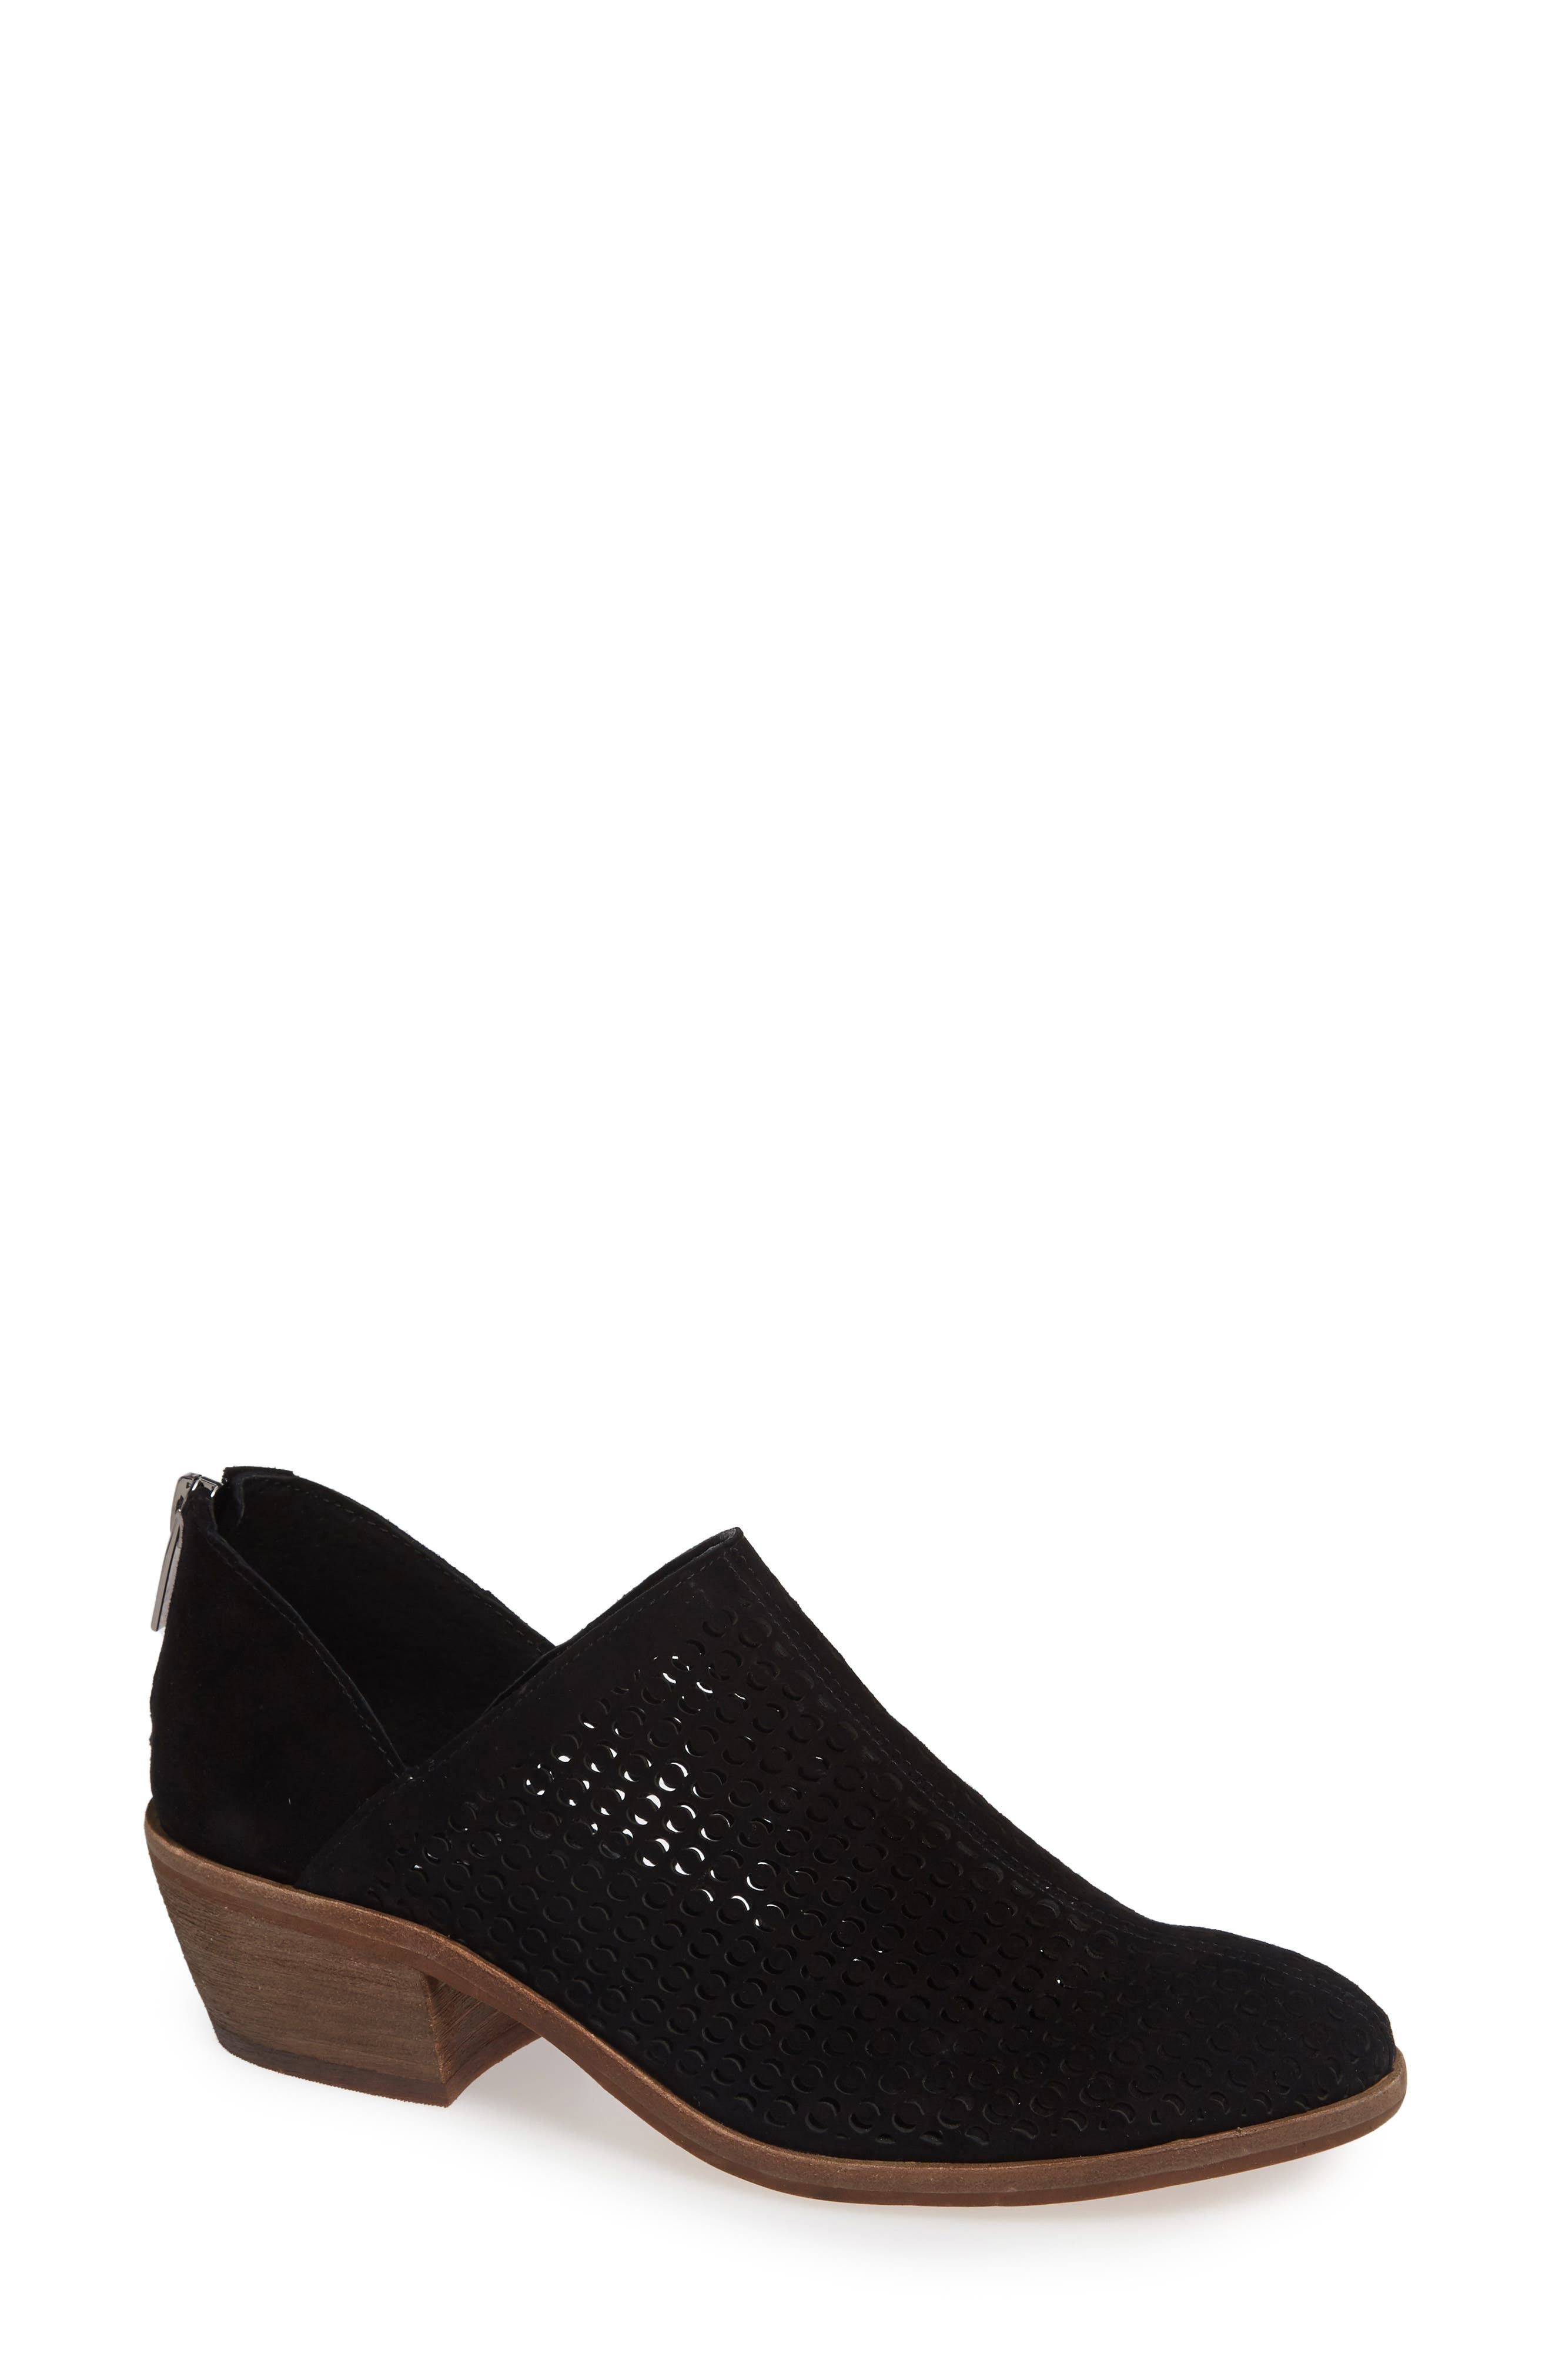 Paleta Boot,                         Main,                         color, BLACK SUEDE